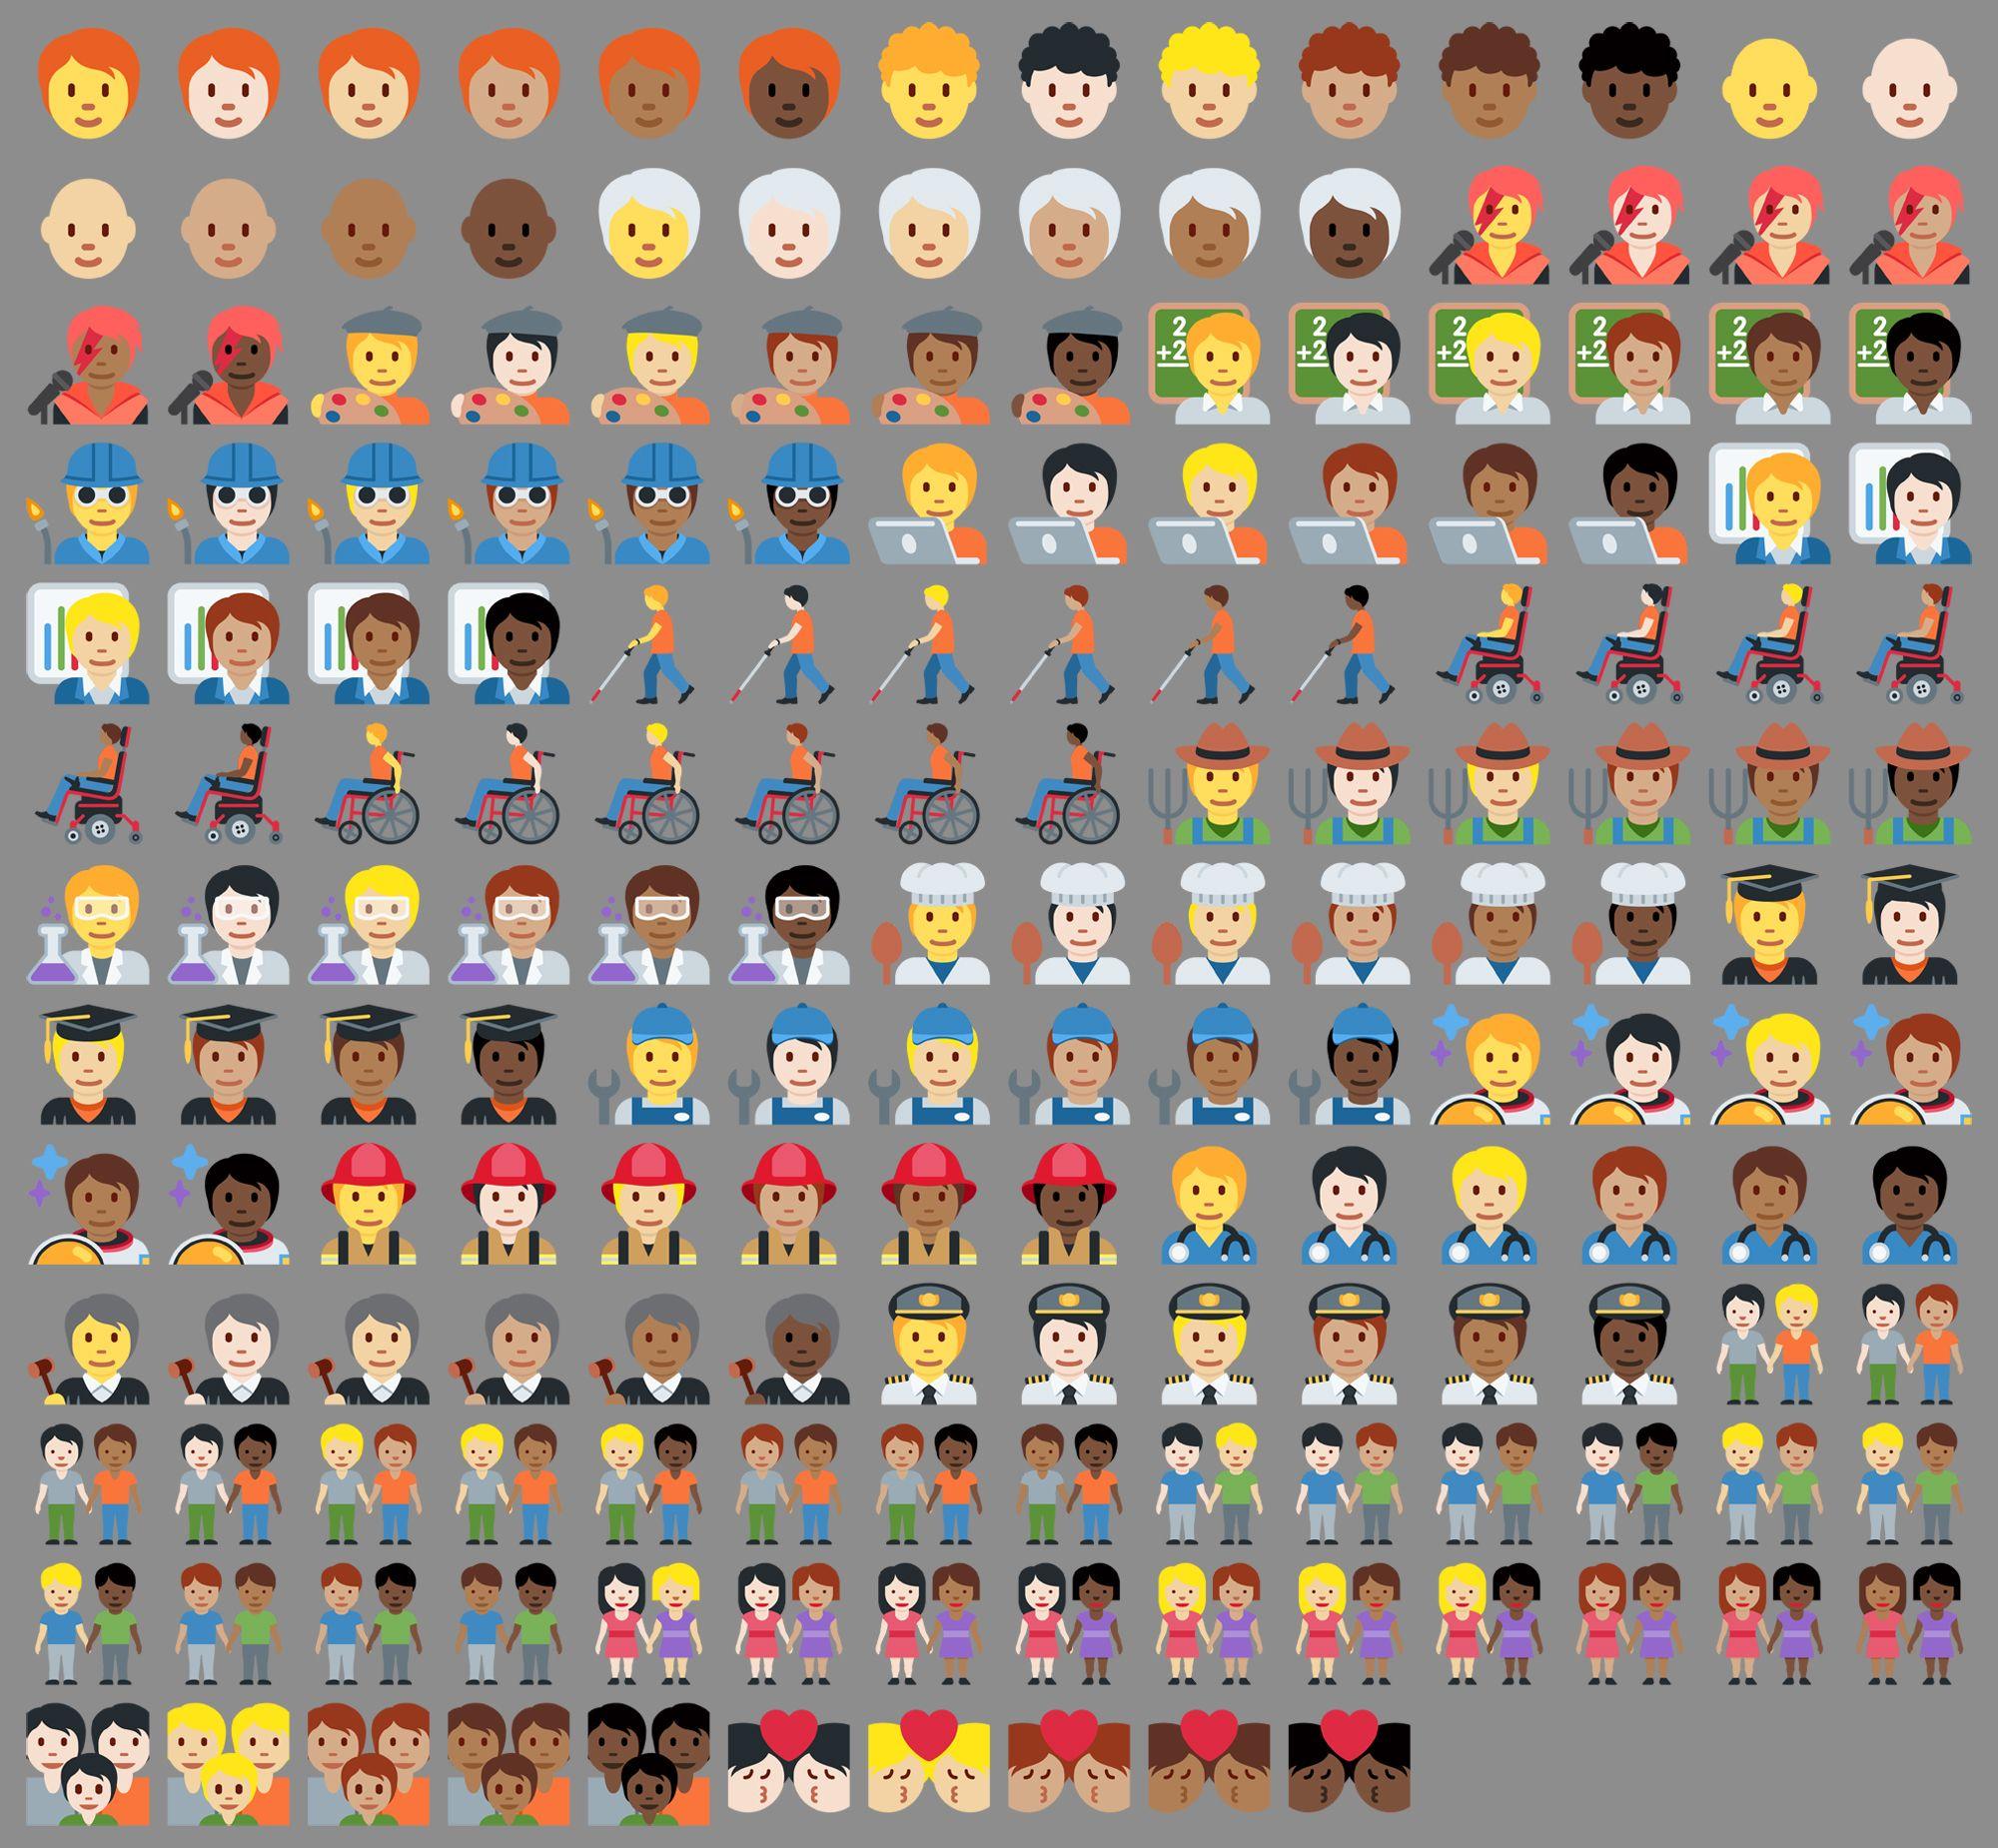 Twemoji-12.3-Changelog-Image